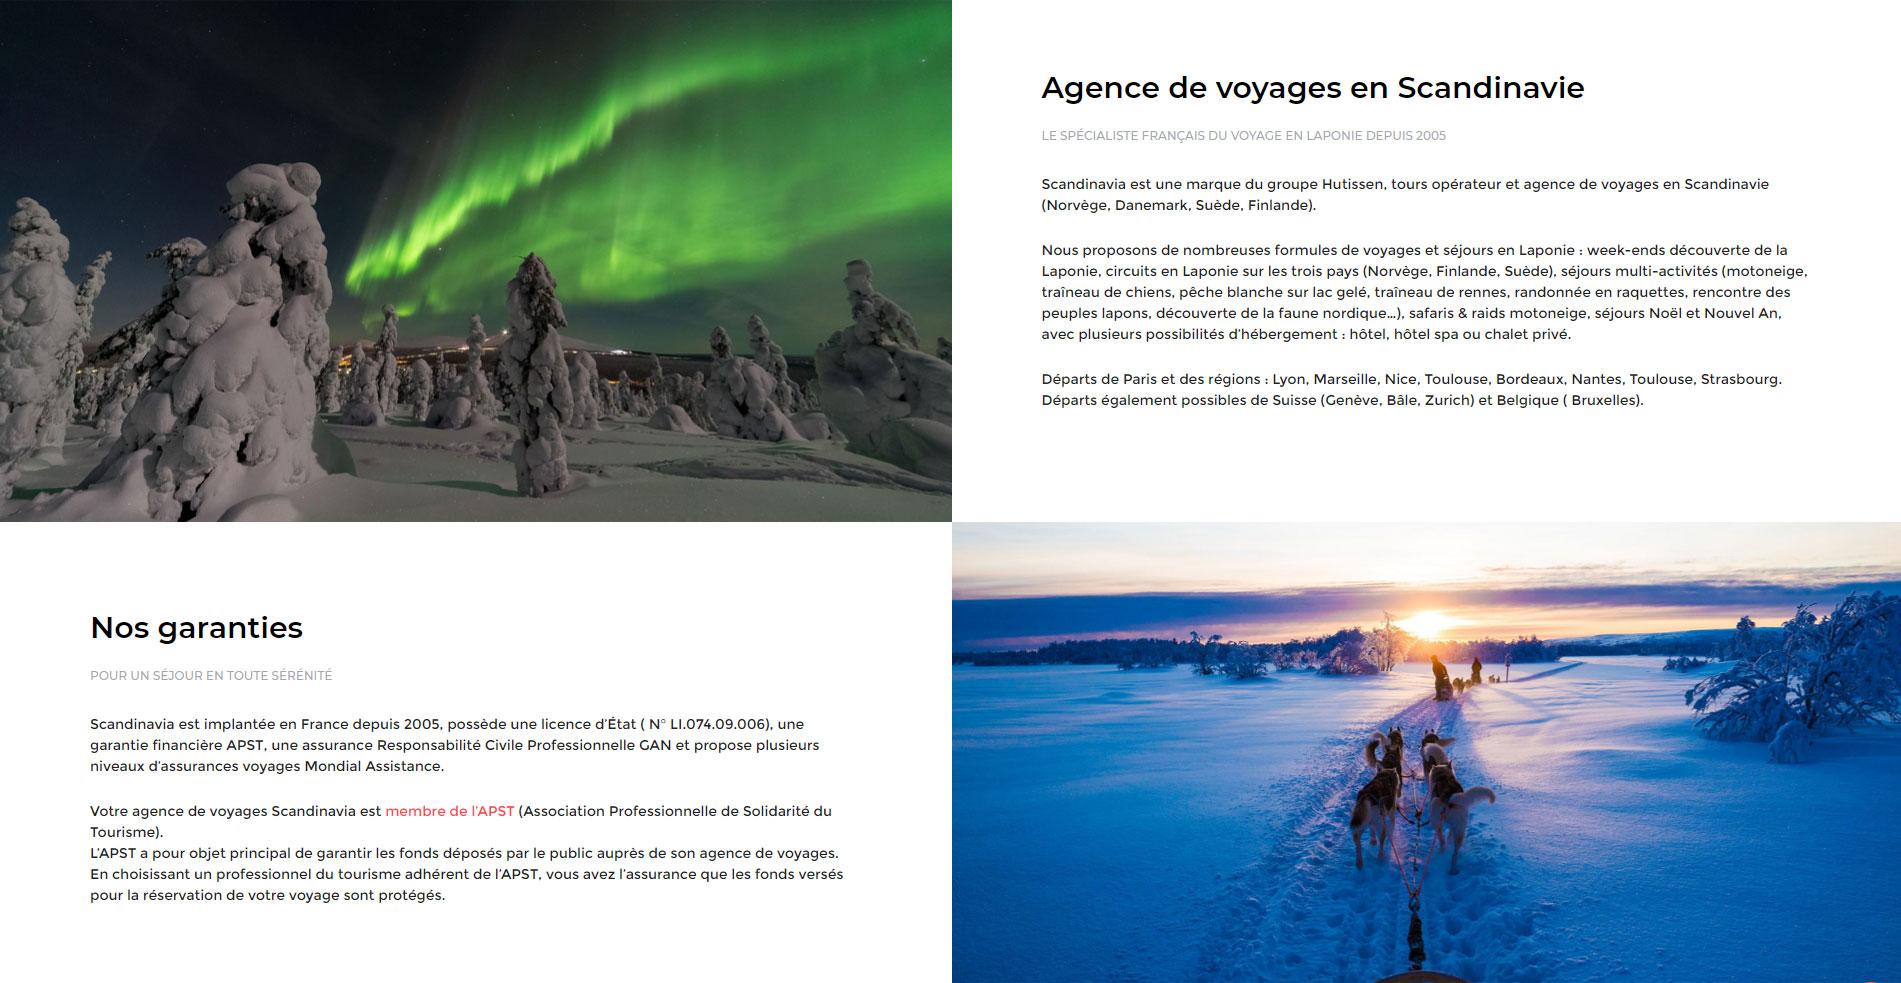 Création du site Scandinavia, page Agence